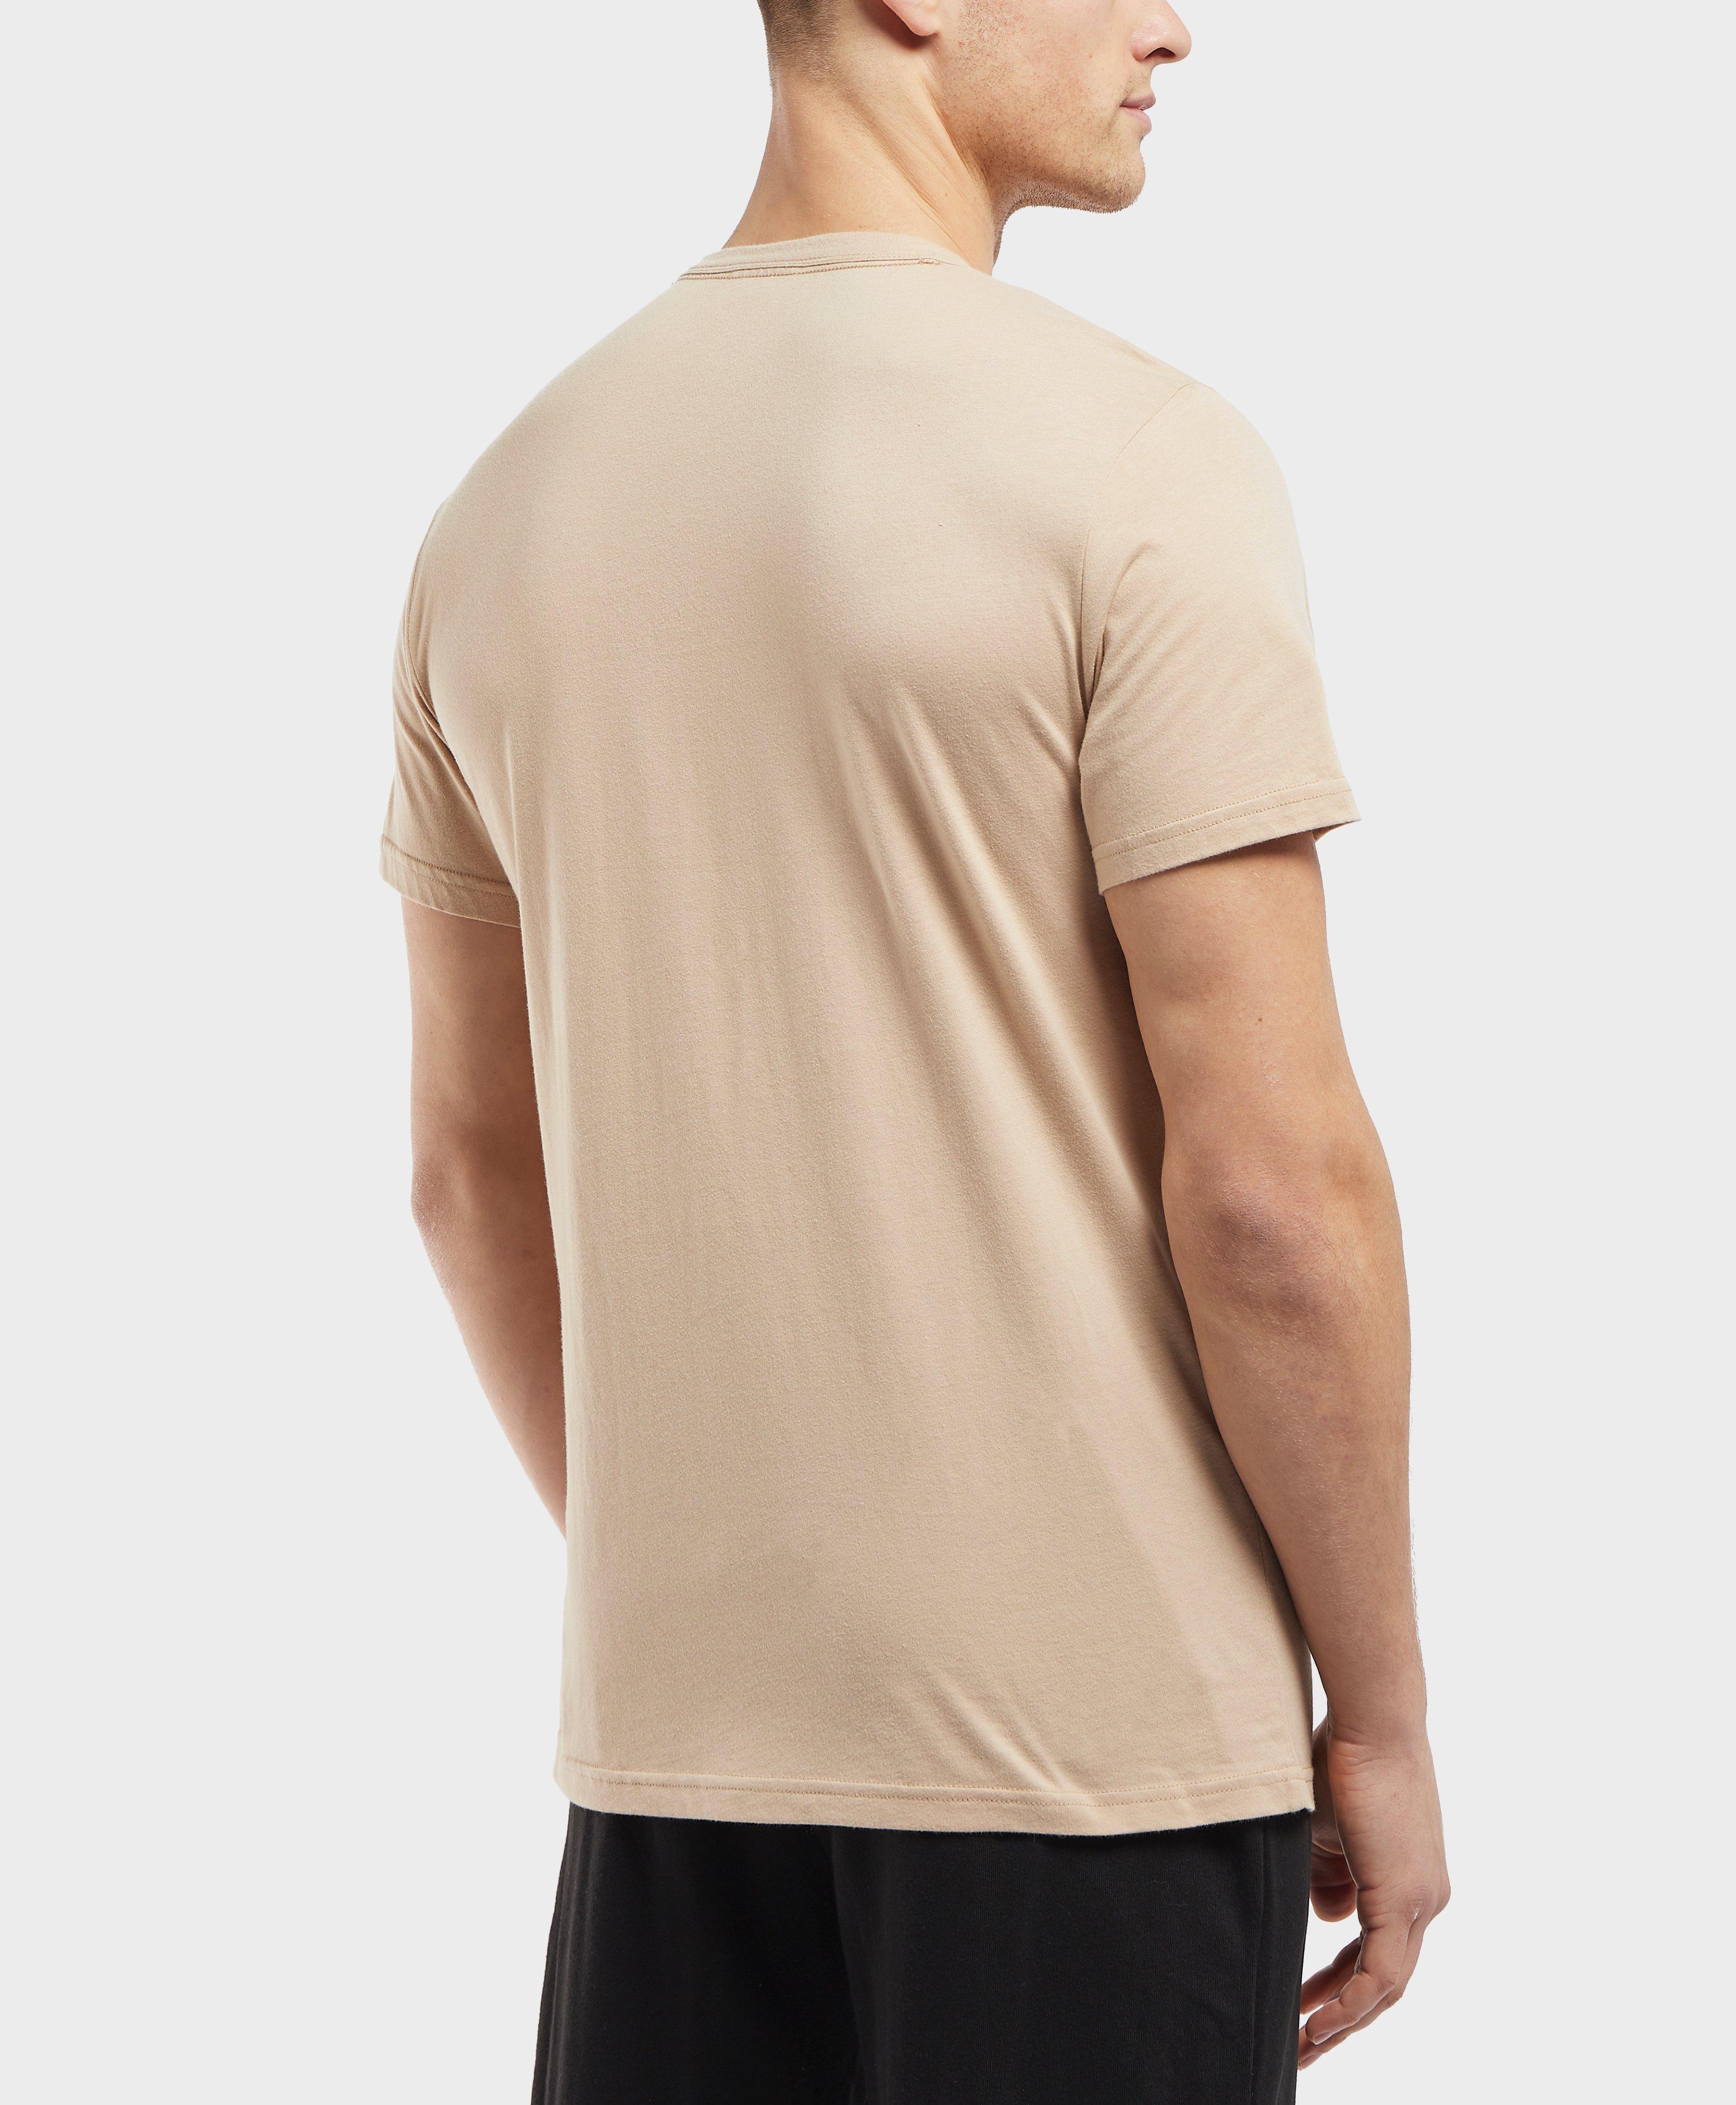 896daa54 Calvin Klein Panel Logo Short Sleeve T-shirt for Men - Lyst